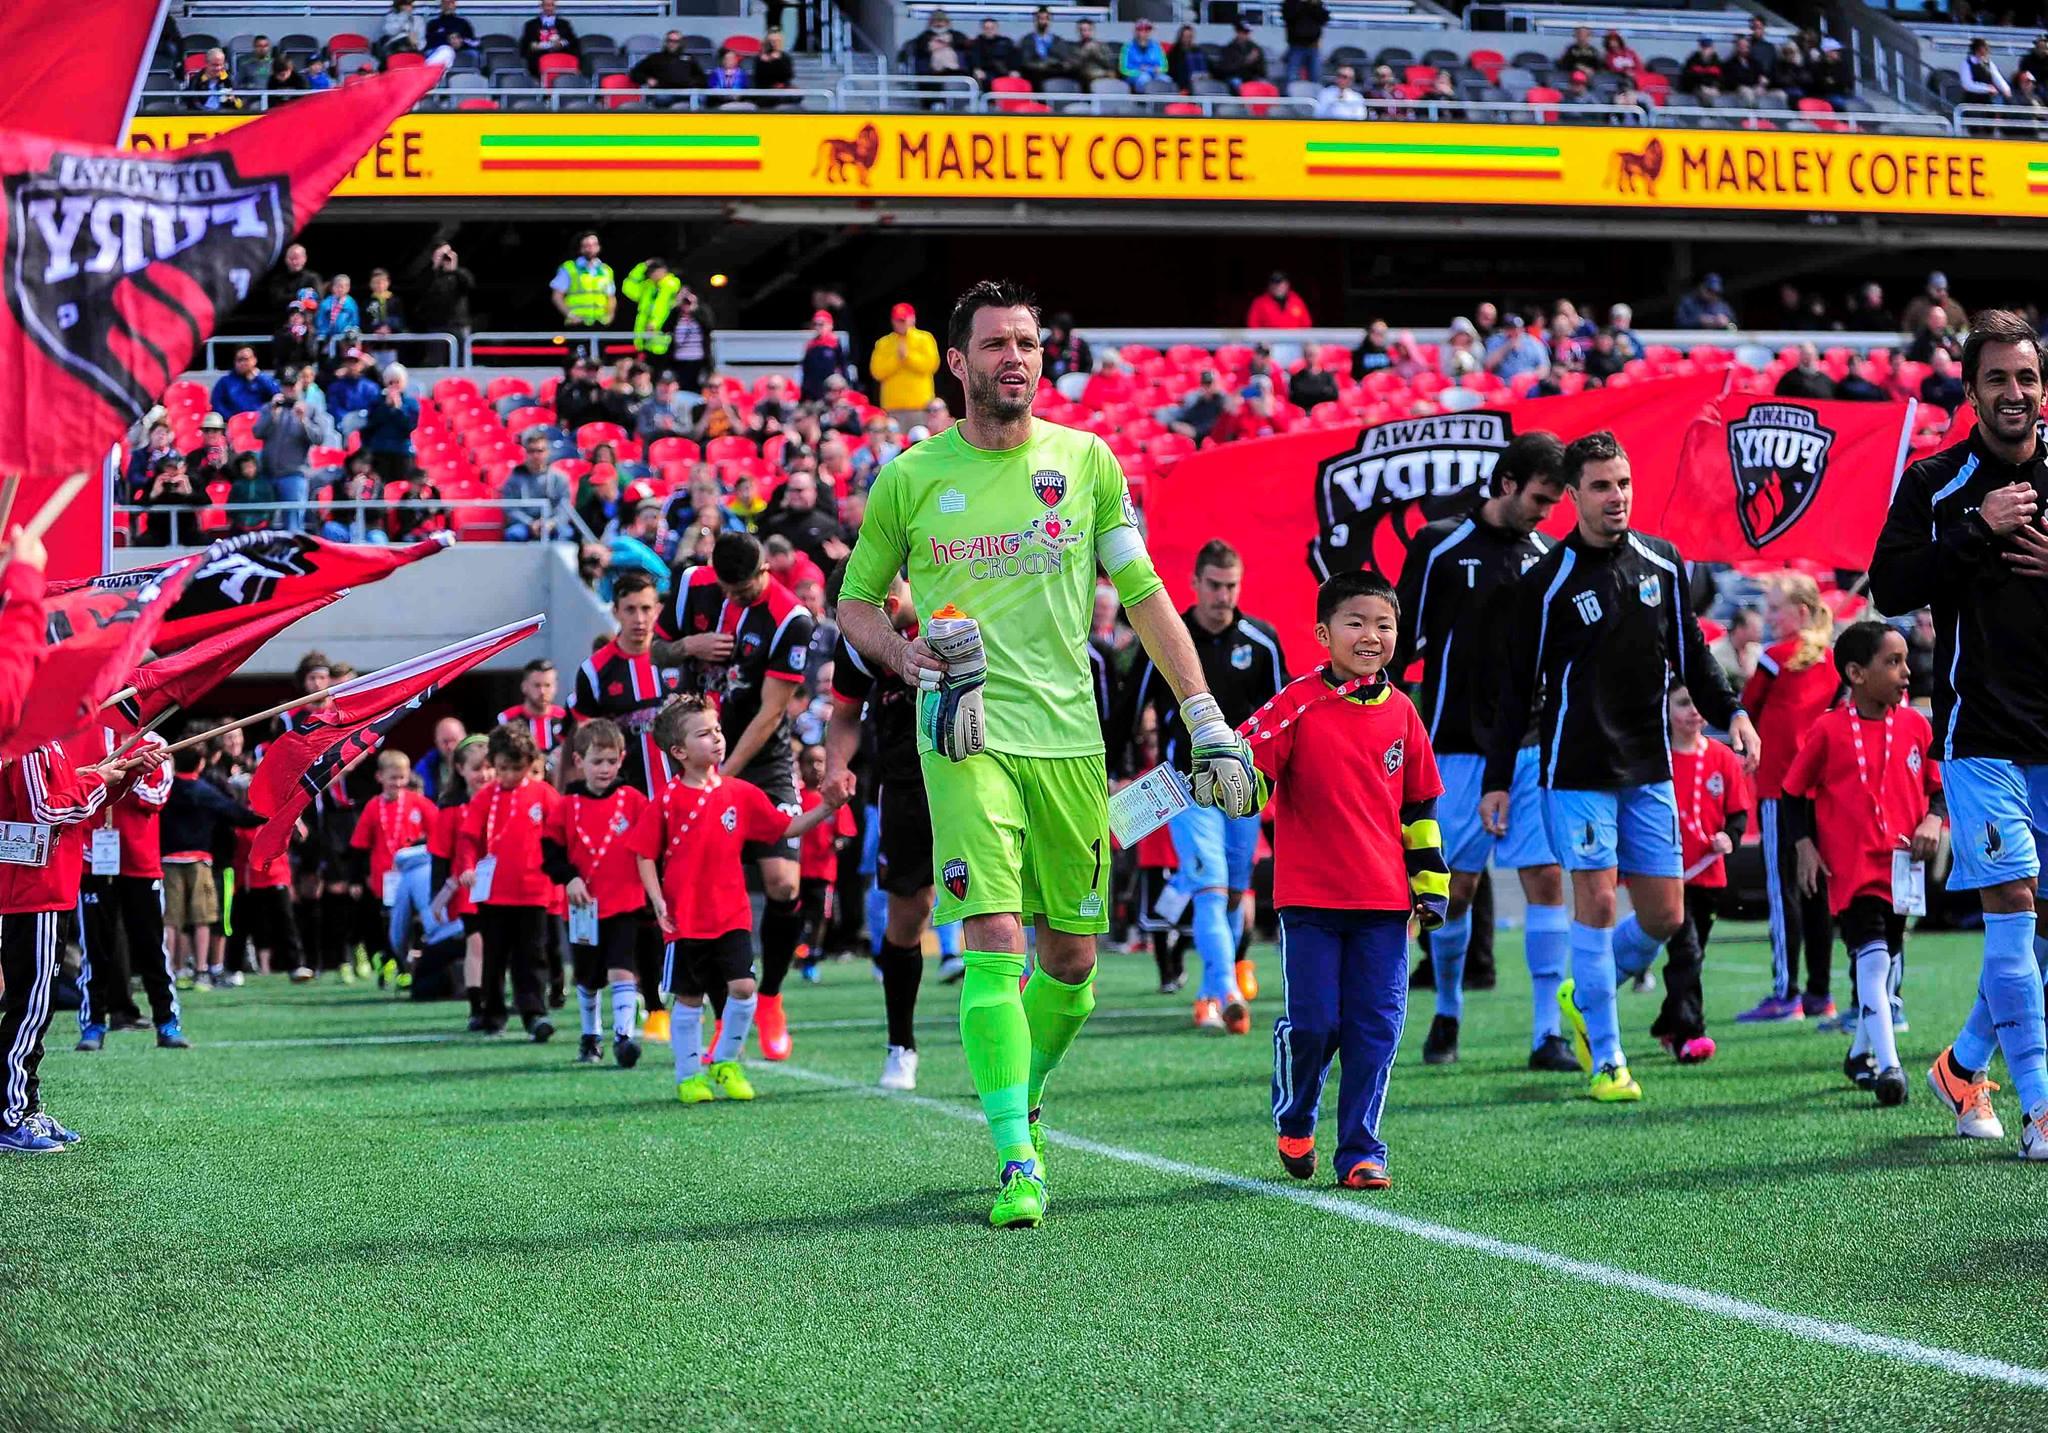 Photo: Ottawa Fury FC